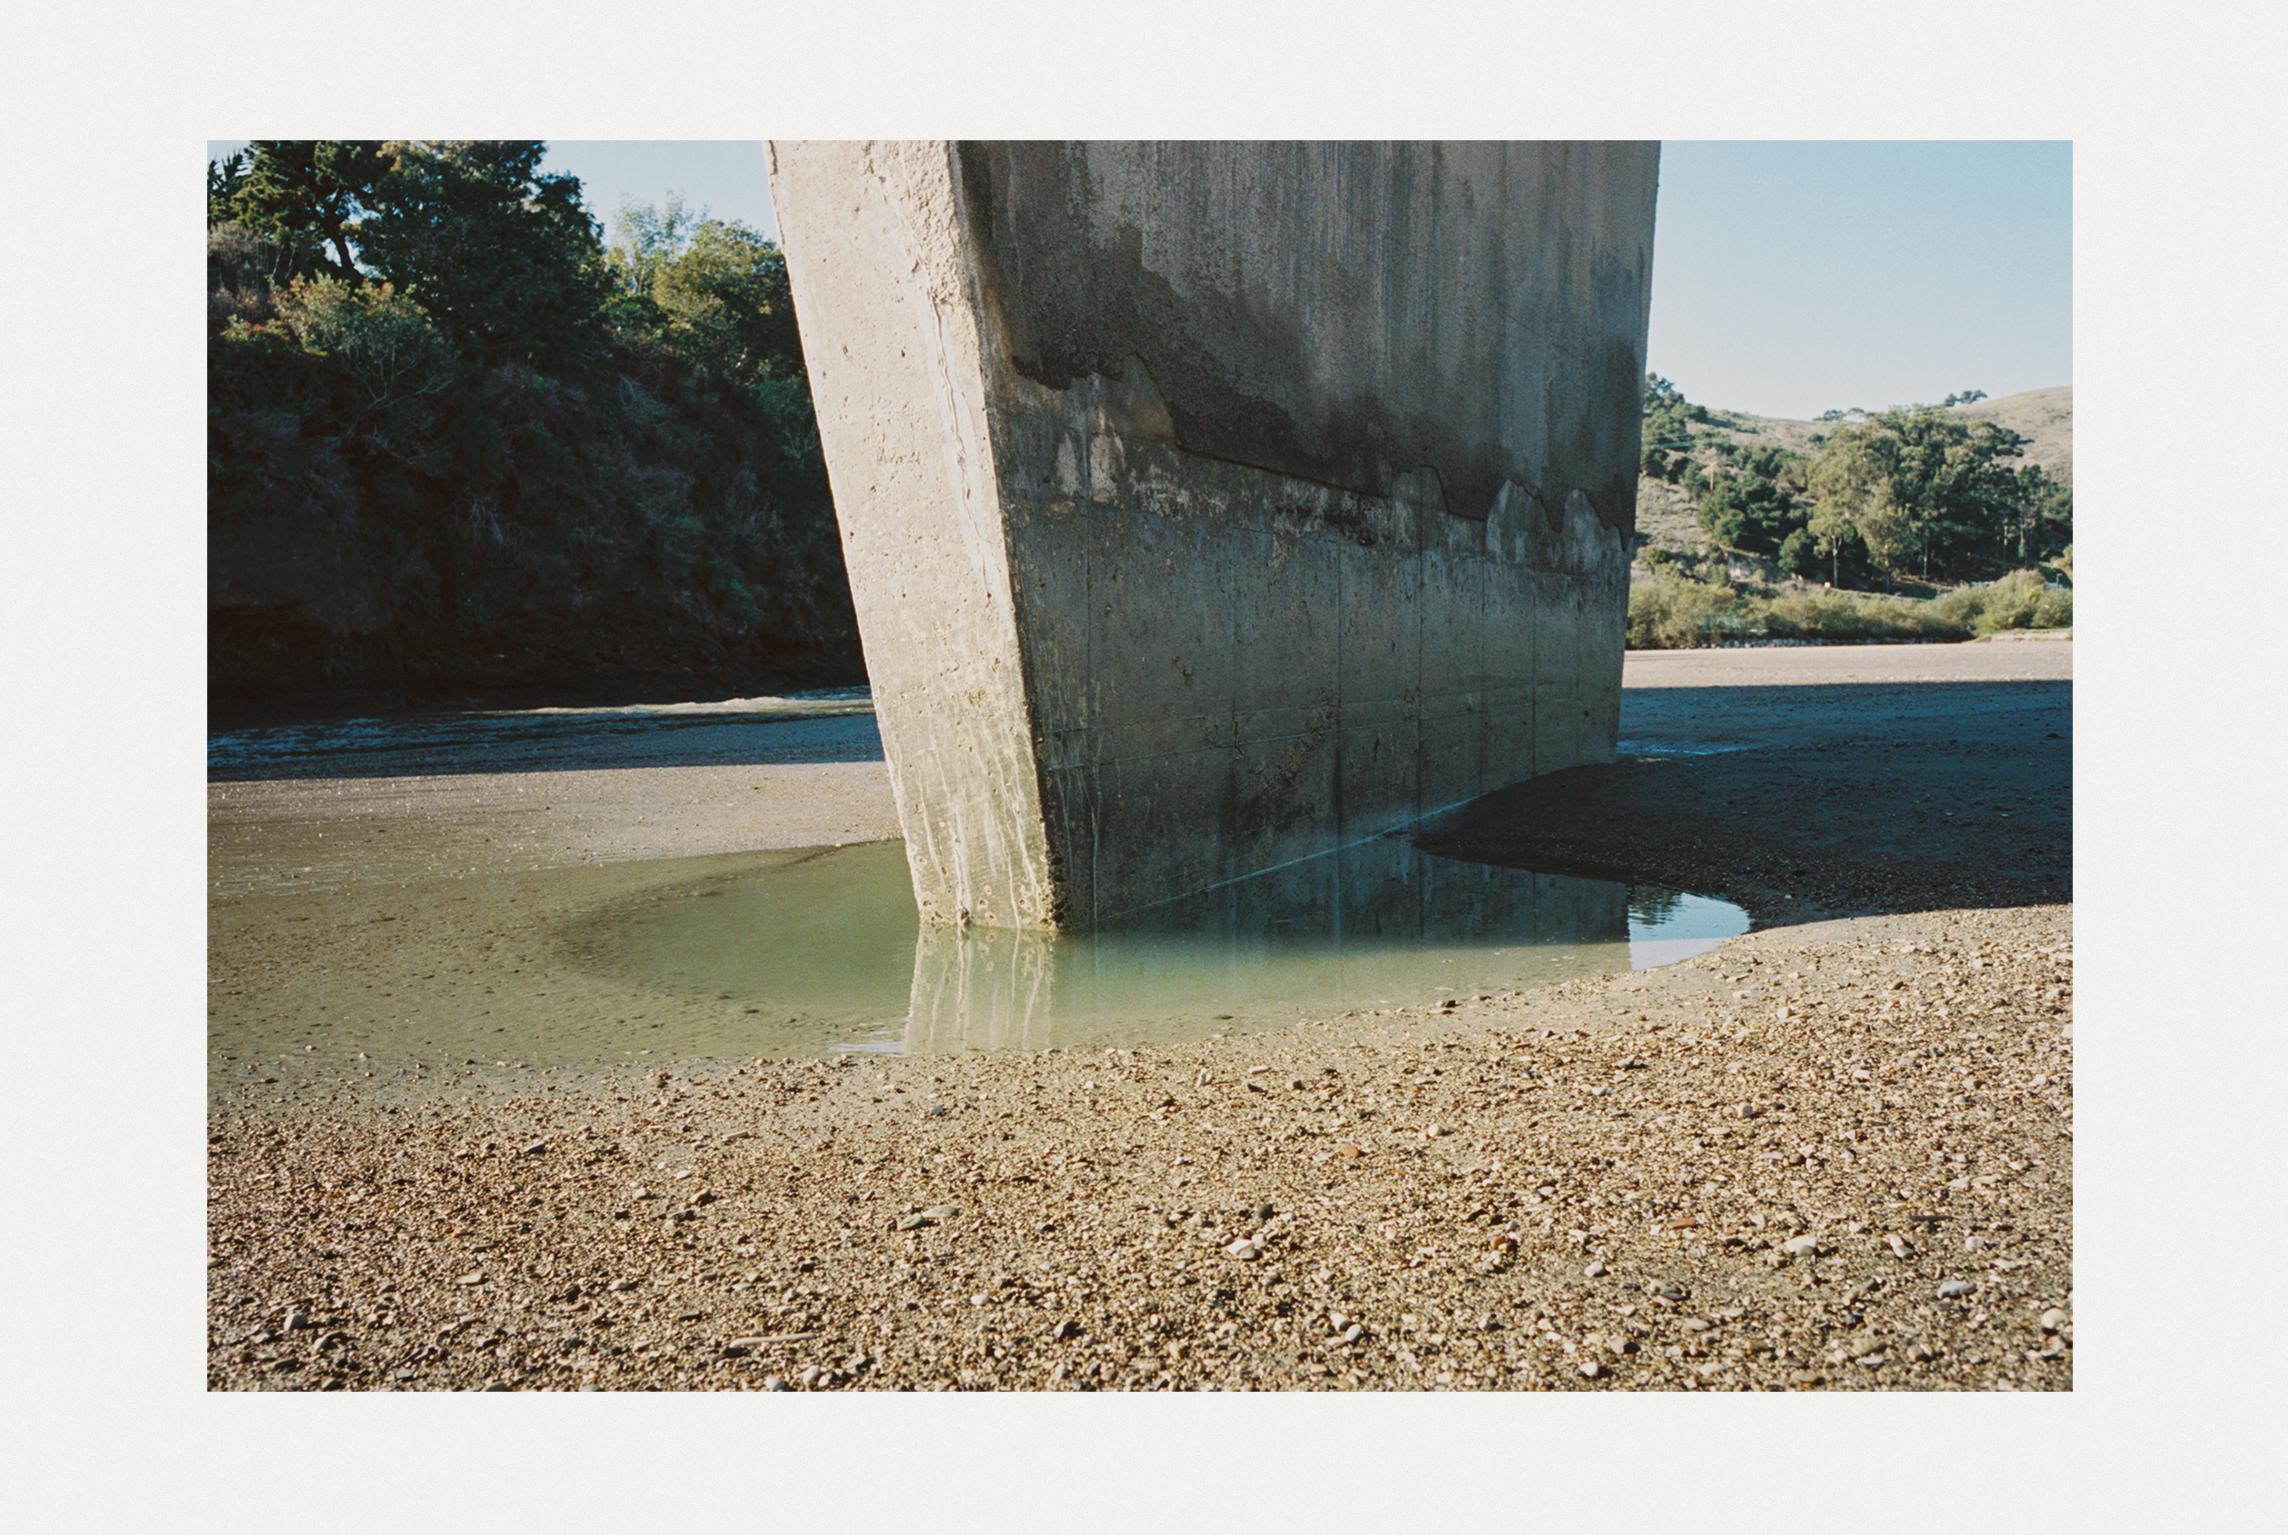 Hanna_Hazel_Slo_Bridge_.jpg